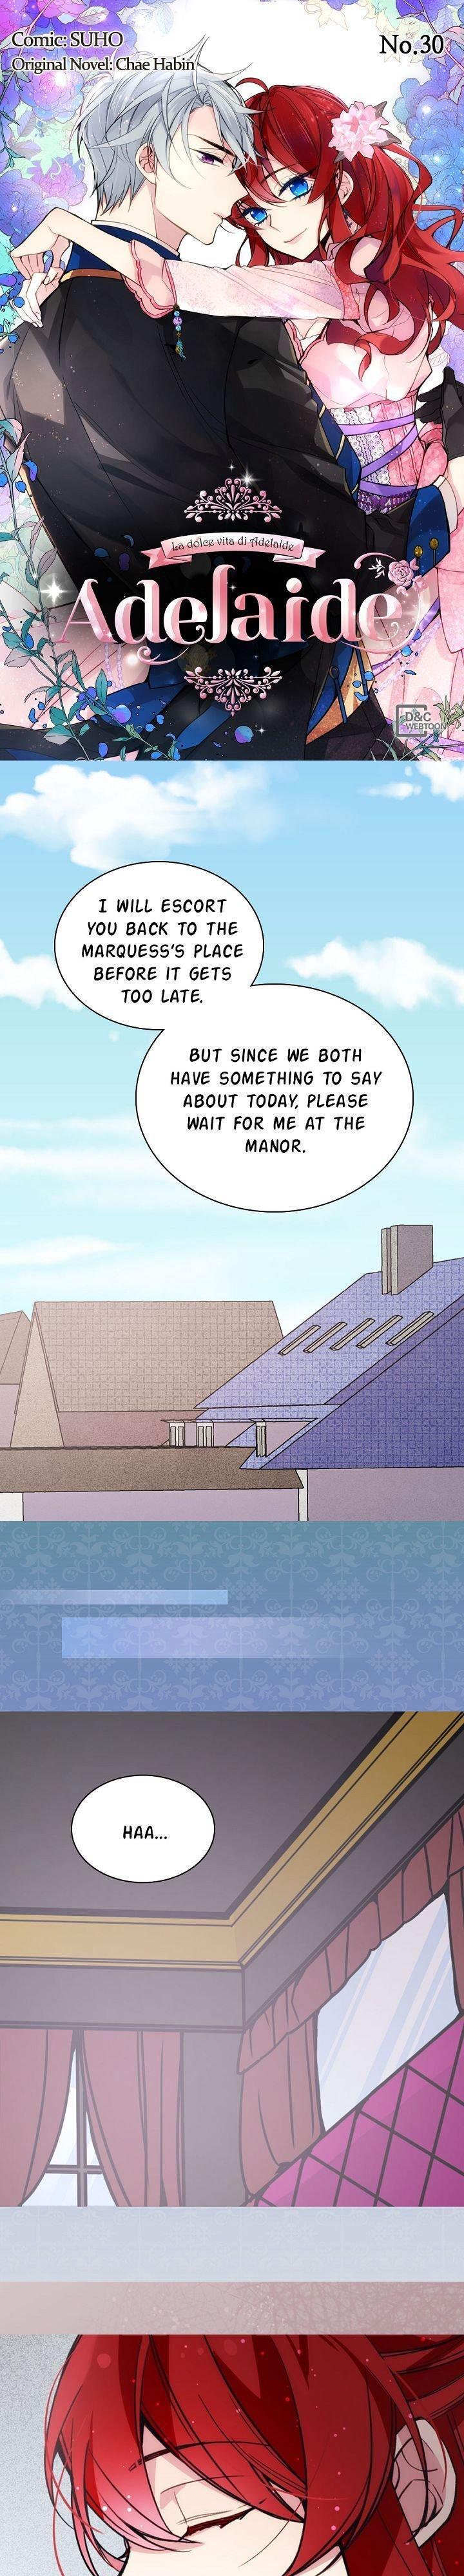 Manga La Dolce Vita Di Adelaide - Chapter 30 Page 1